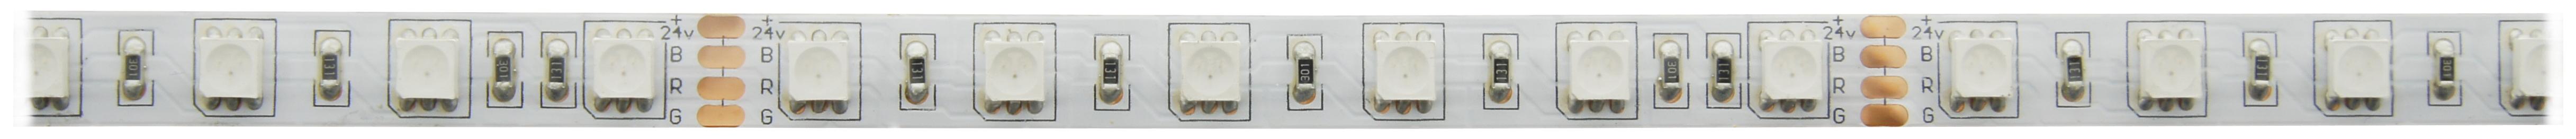 1 Stk Flexstrip 72 RGB 100% Mix, 15,1W/m, 447lm/m 24VDC, IP44 l=5m LIFS008005